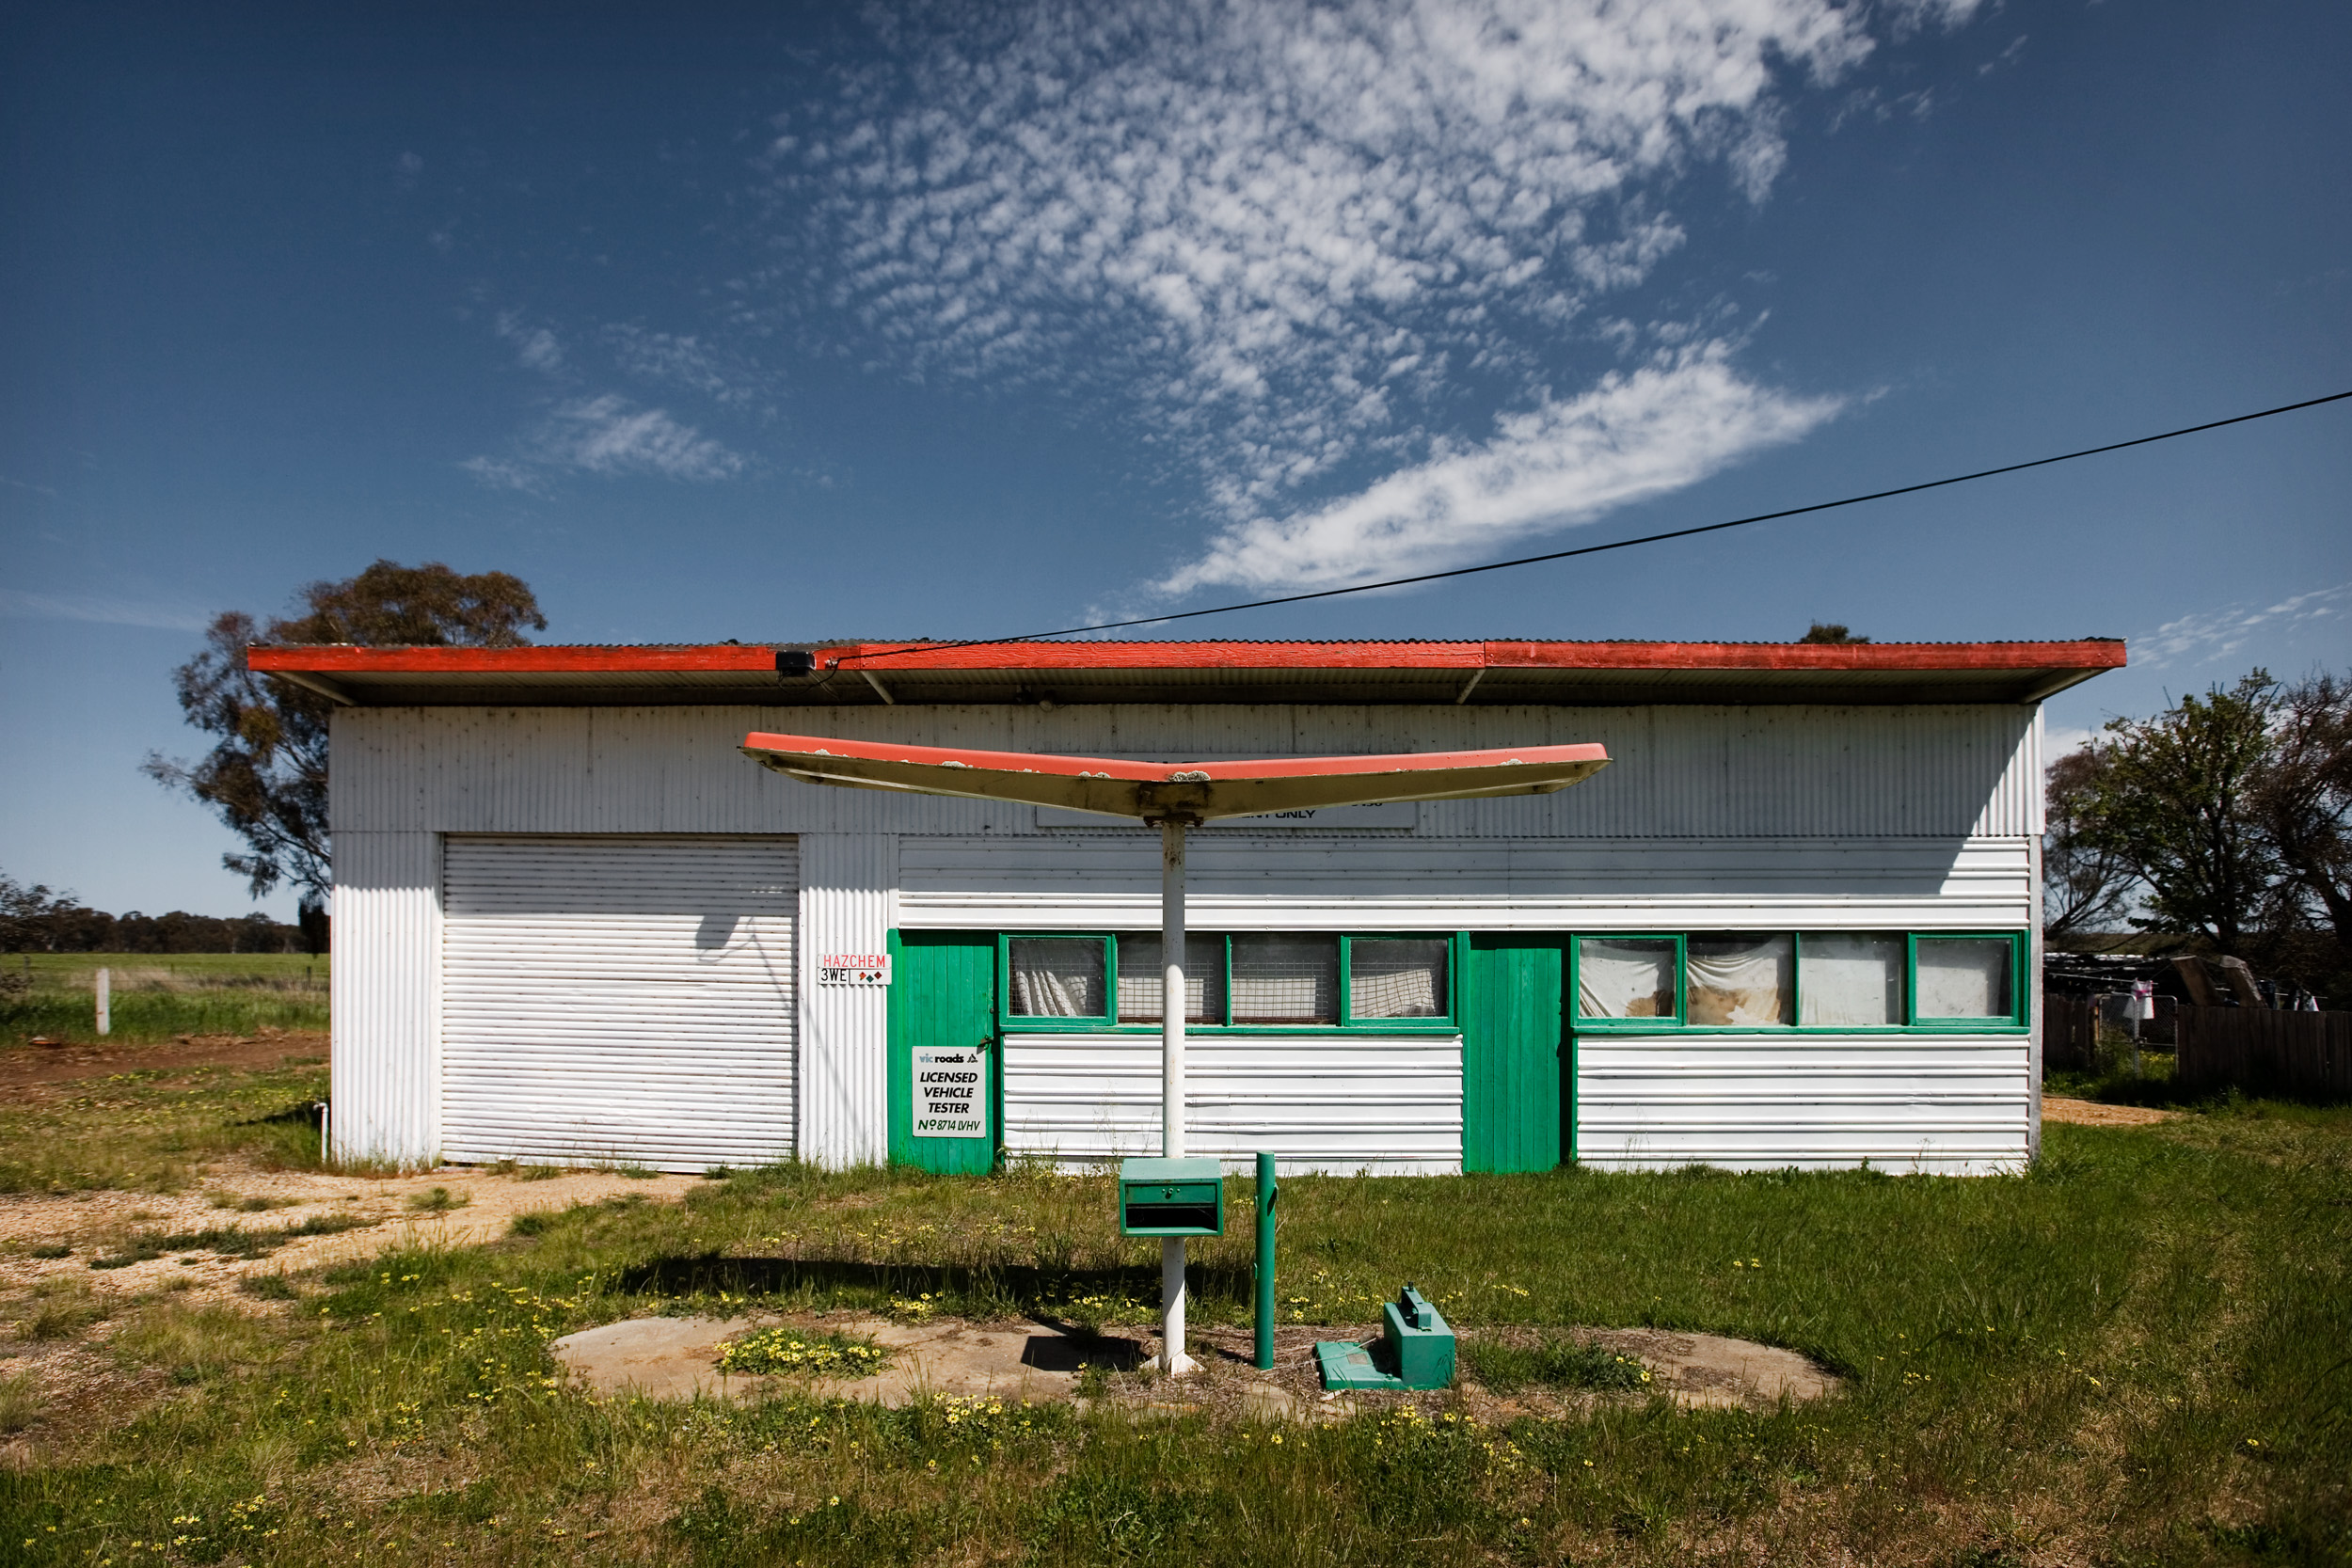 Driveway Service, Campbelltown, 2013